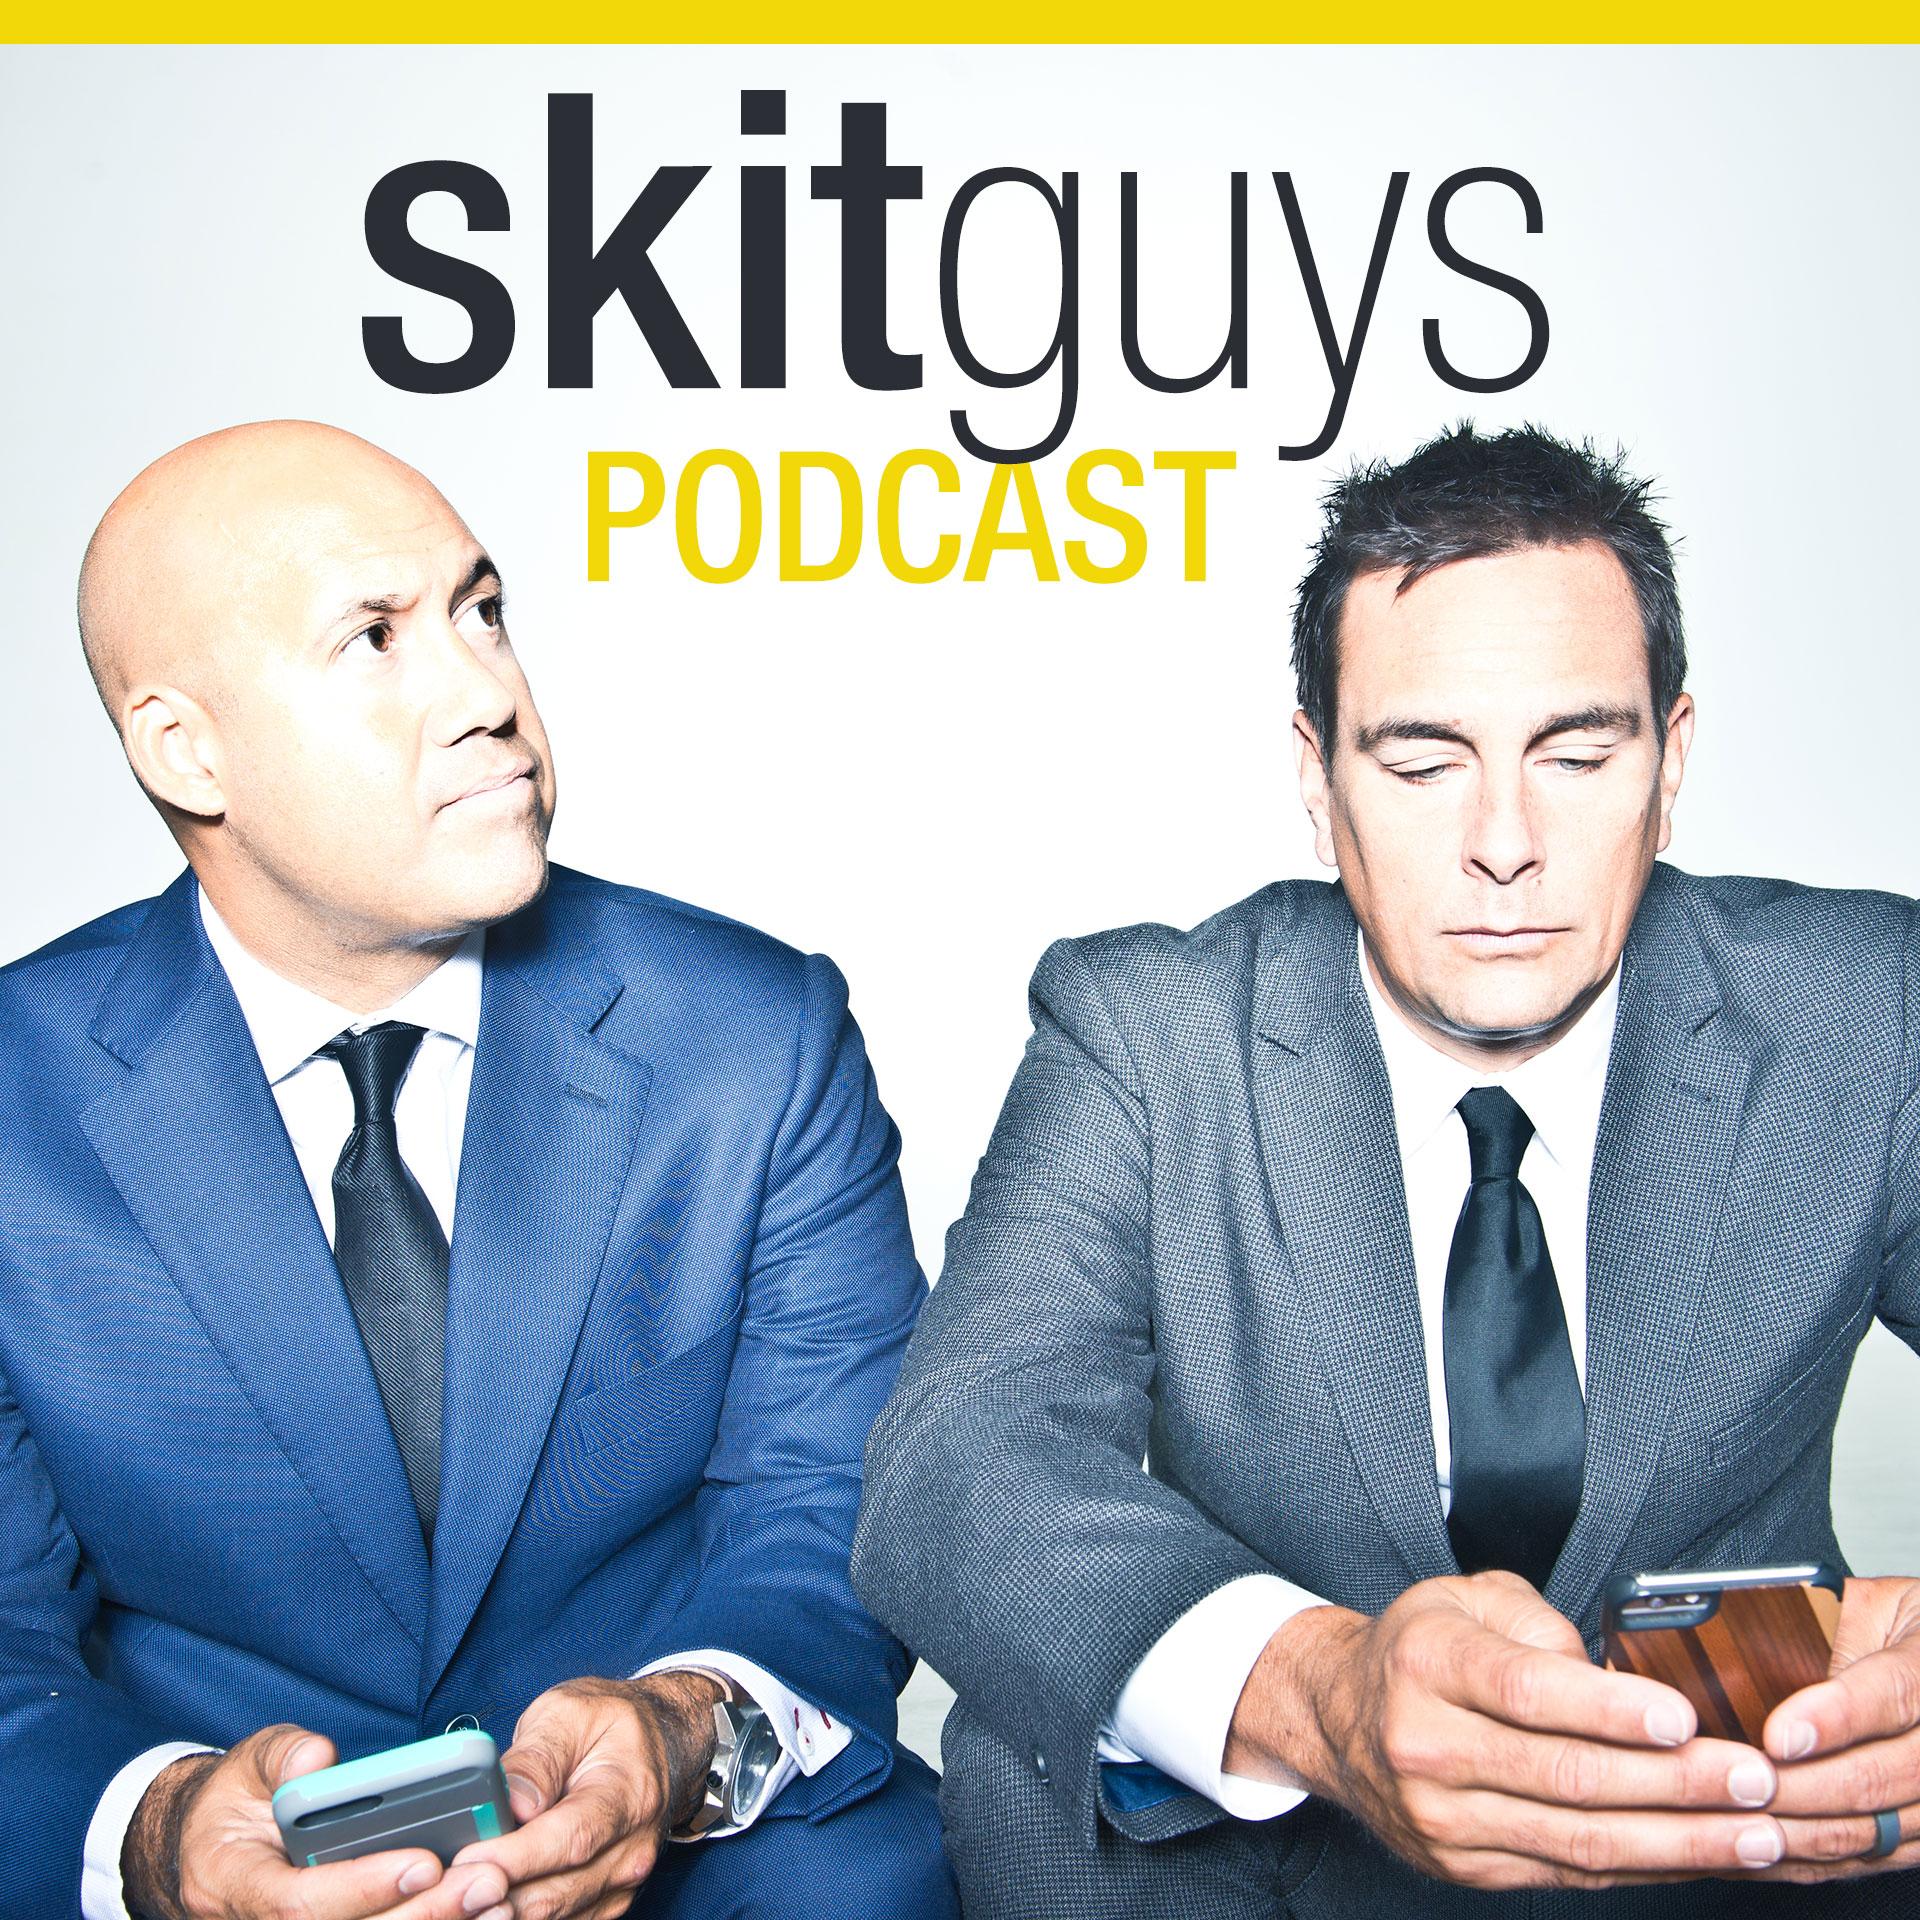 Skit Guys Podcast